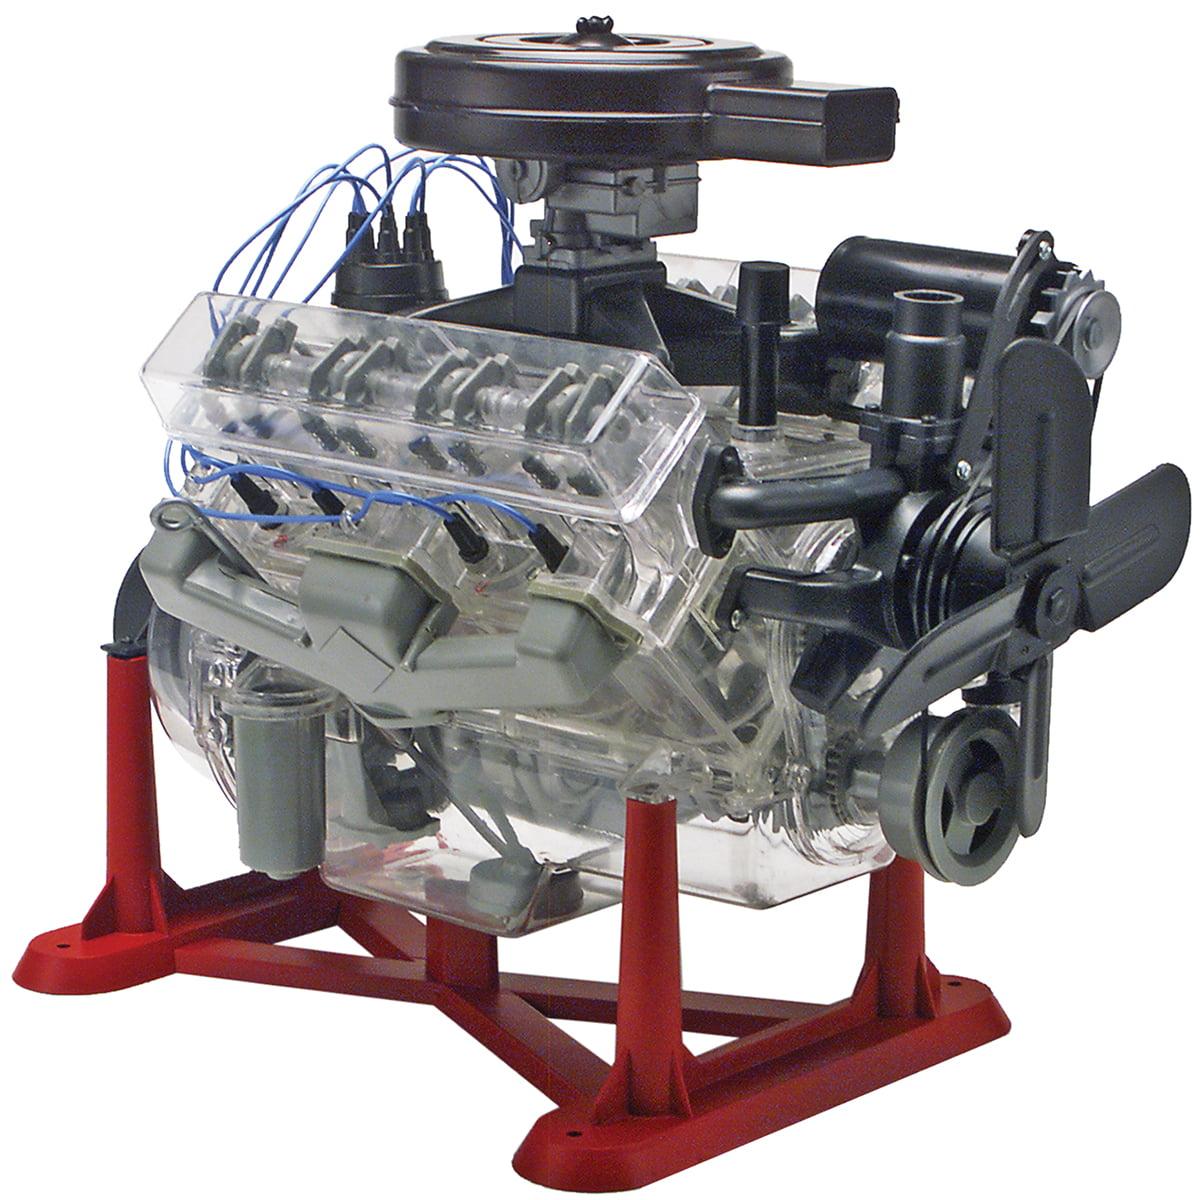 Revell 1:4 Scale Visible V-8 Engine Model Kit by Revell